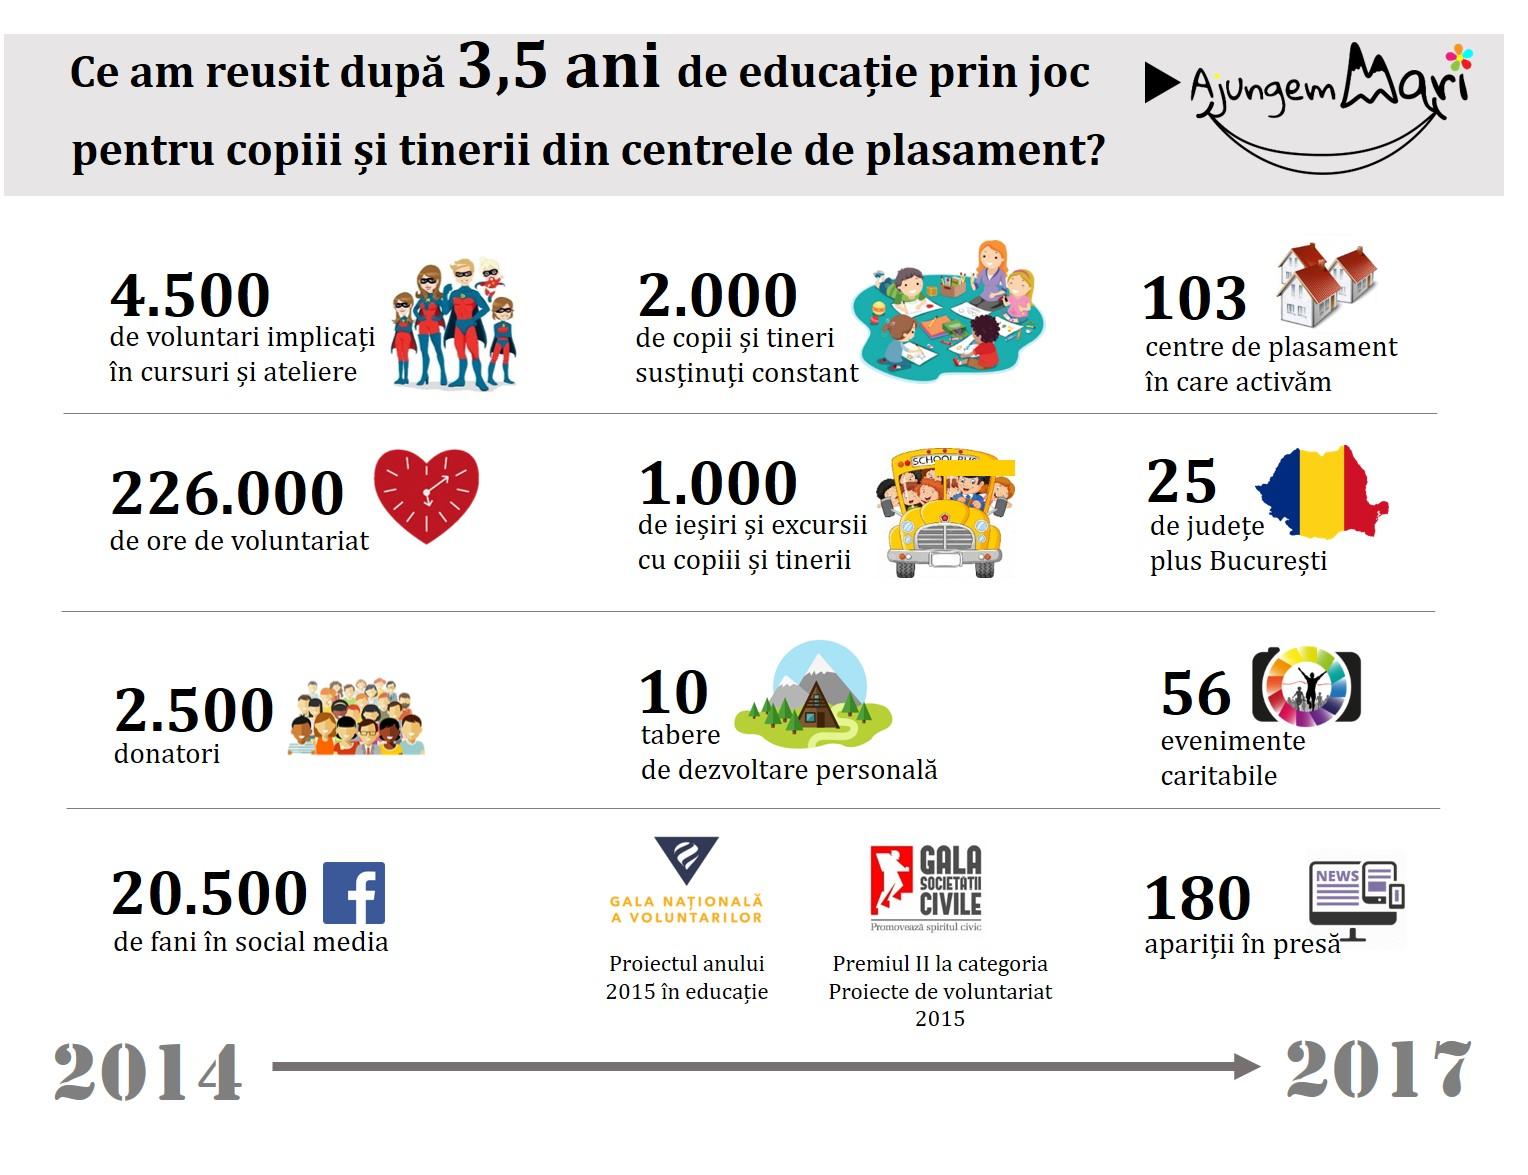 infografic Ajungem MARI_3,5 ani